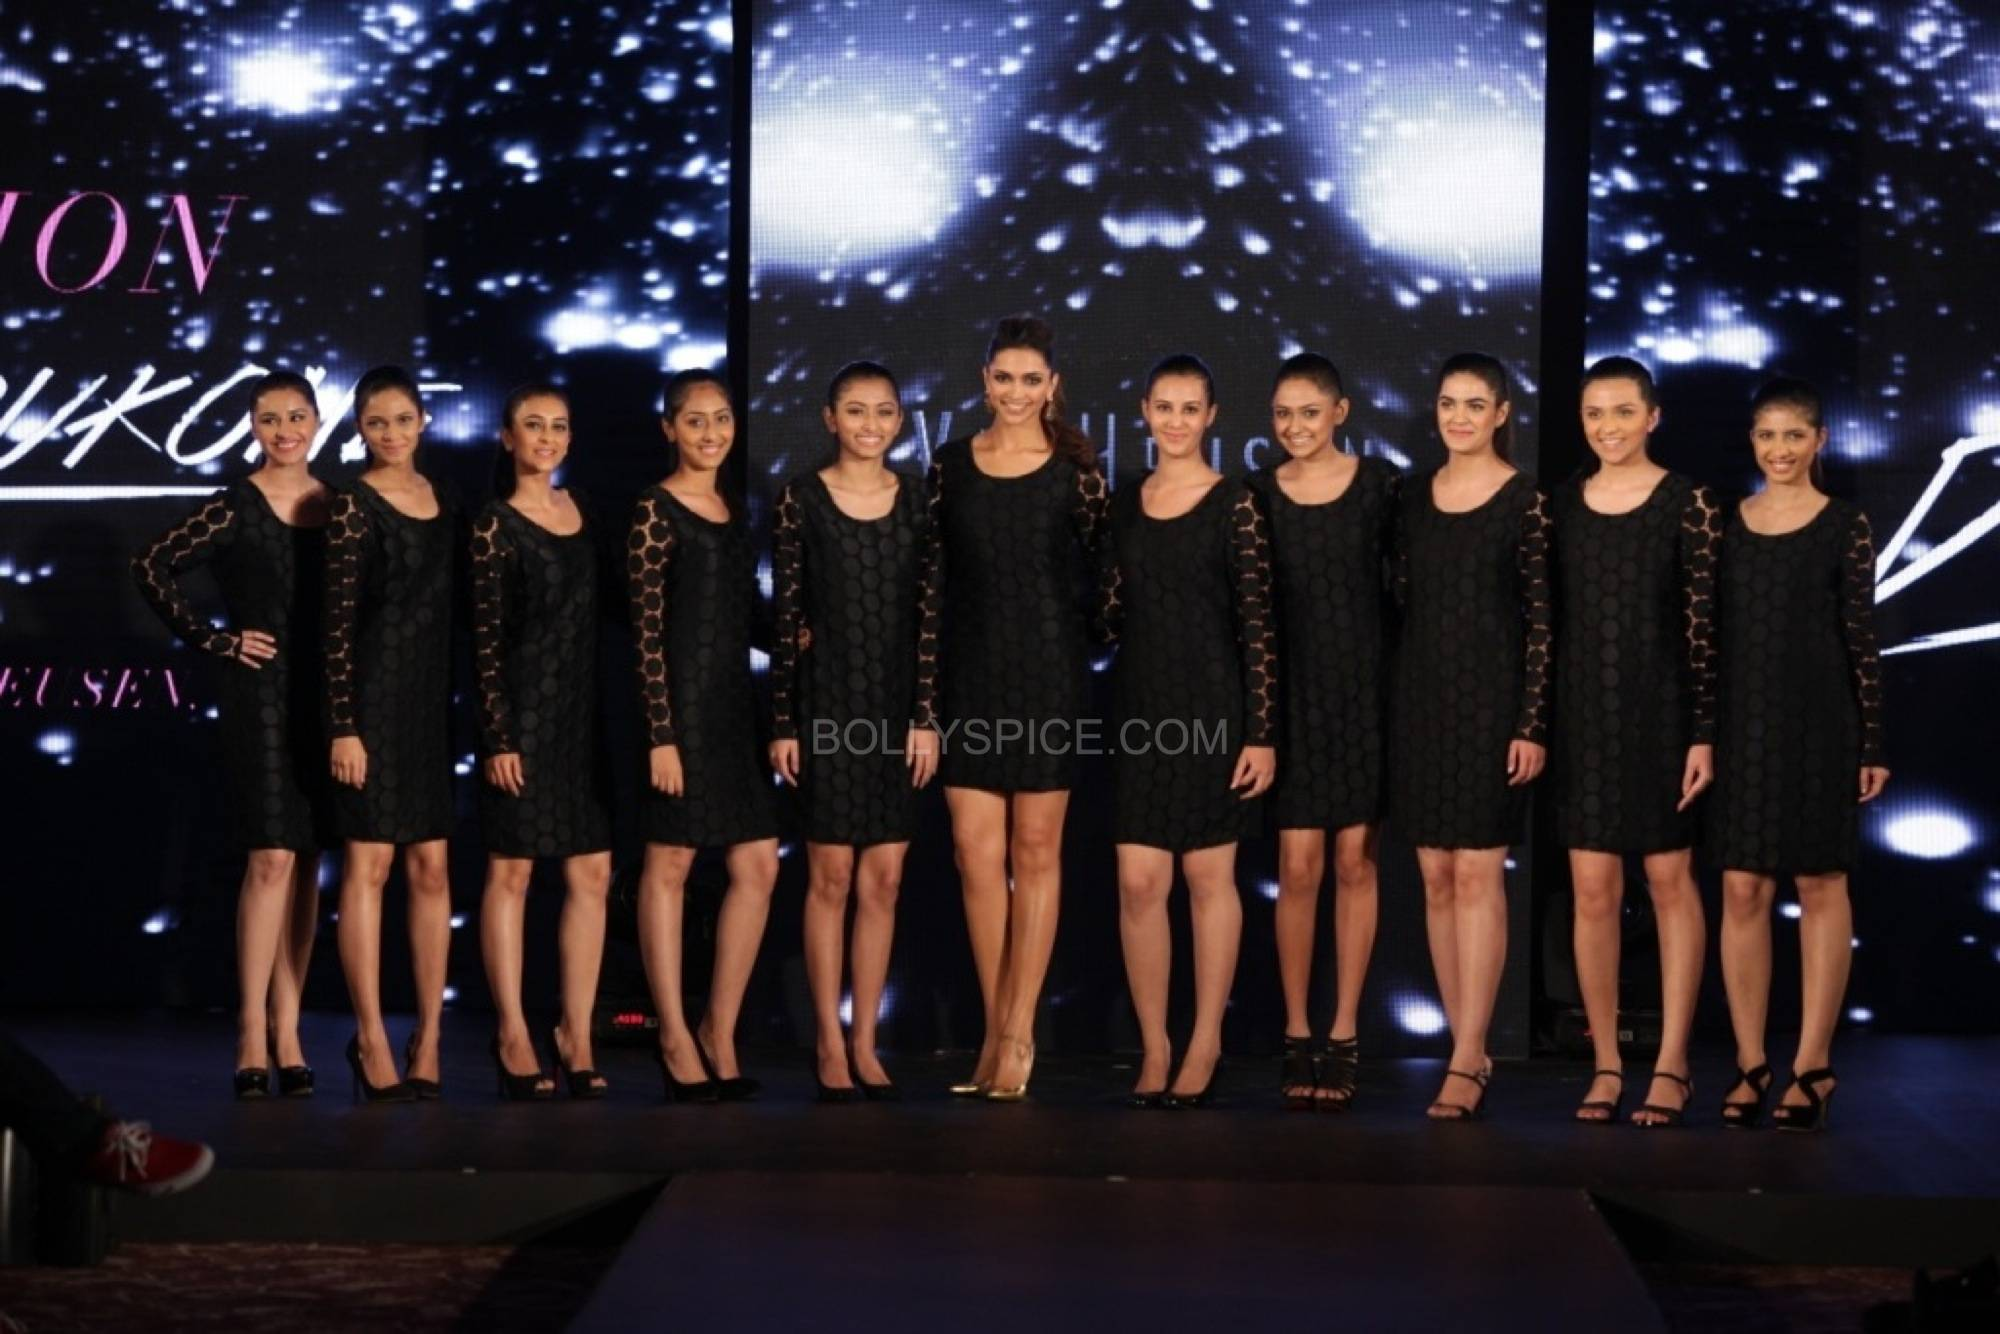 deepikapadukonefanfadhionshow4 Deepika Padukones Fans Fashion Show for Van Heusen